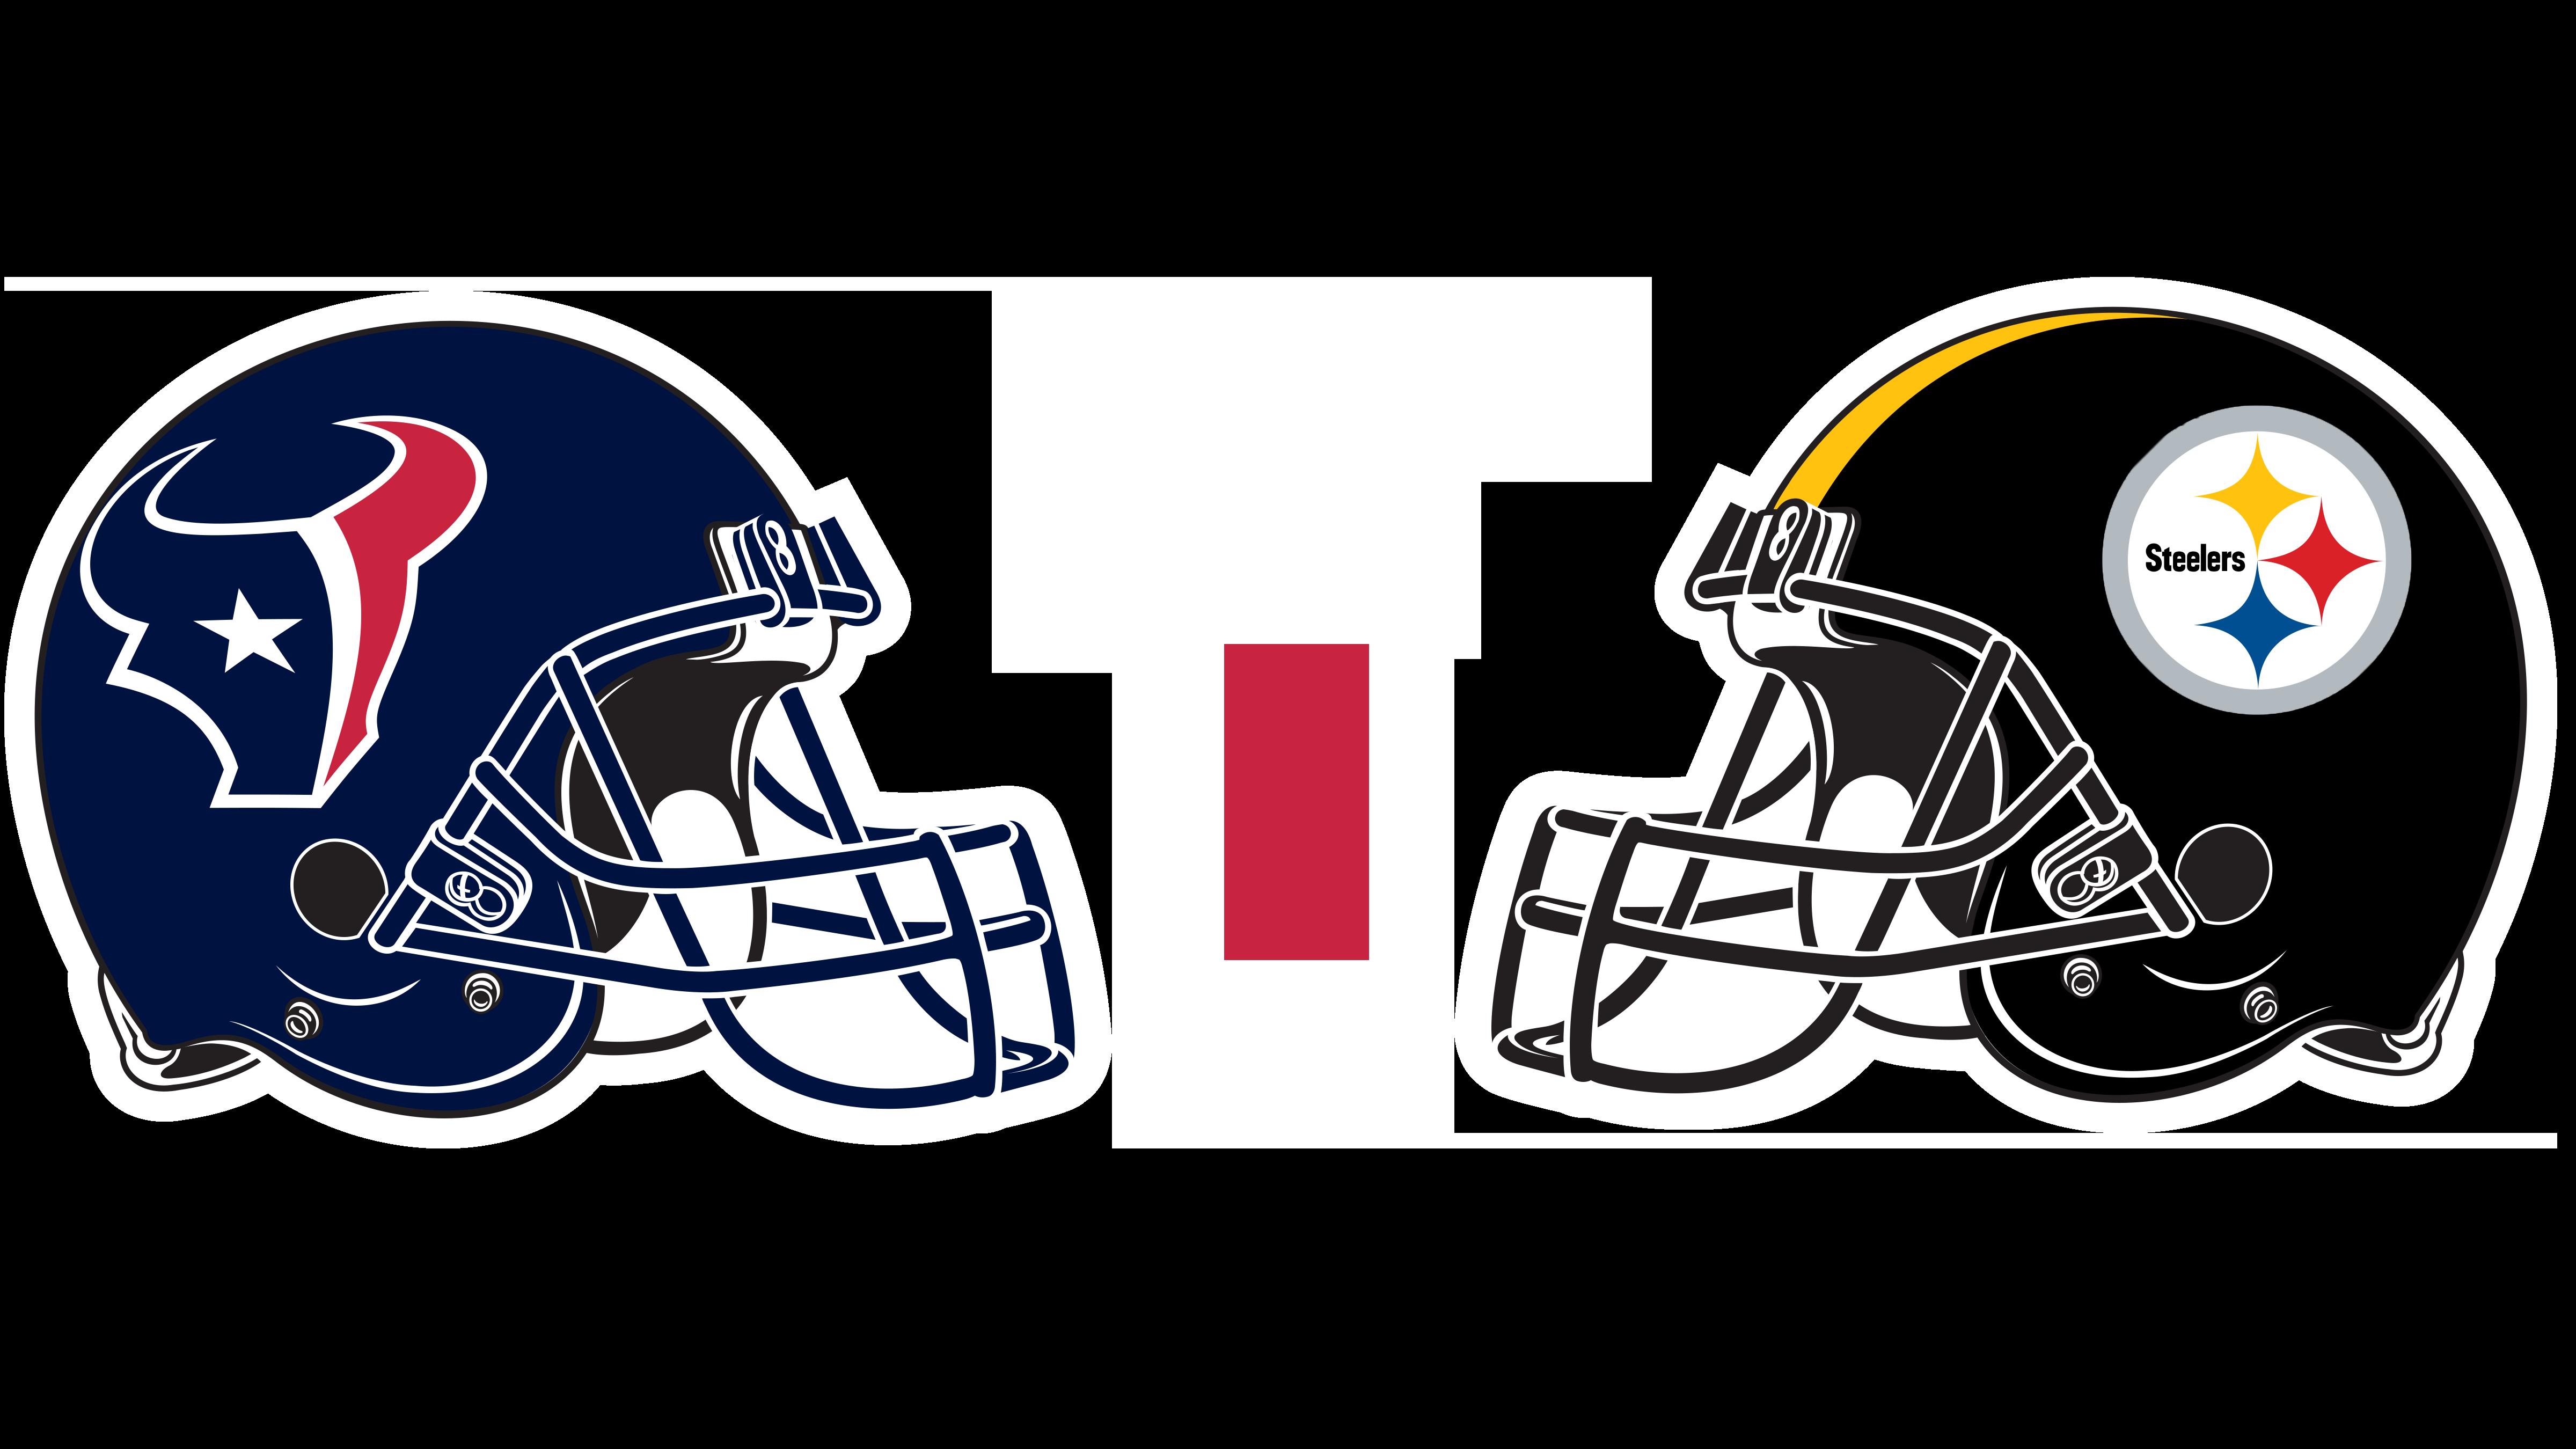 Houston Texans helmet and Pittsburgh Steelers helmet